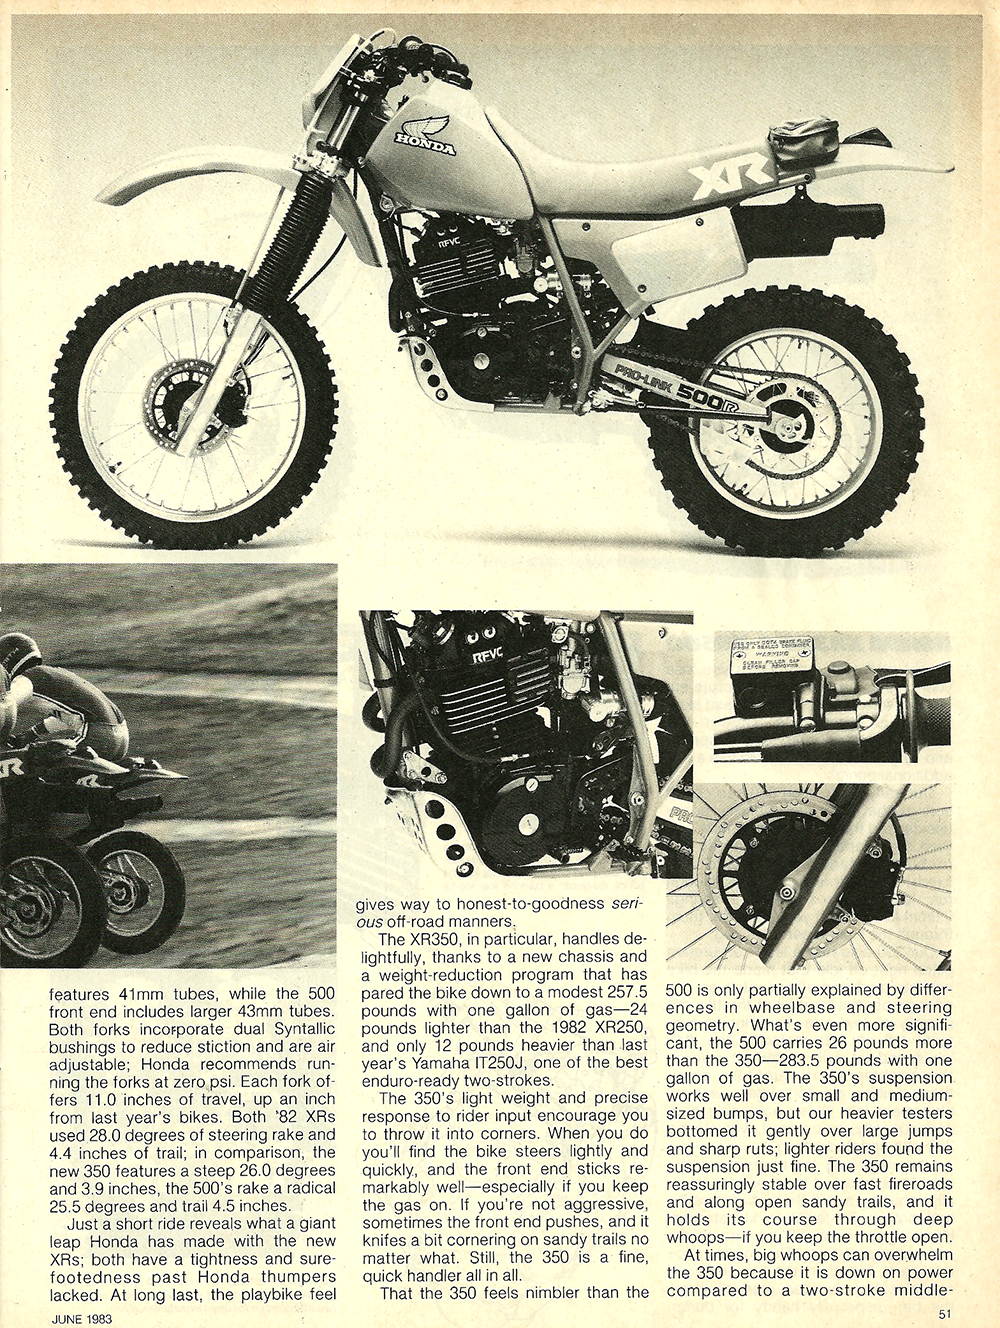 1983 Honda XR350R XR500R road test 4.jpg